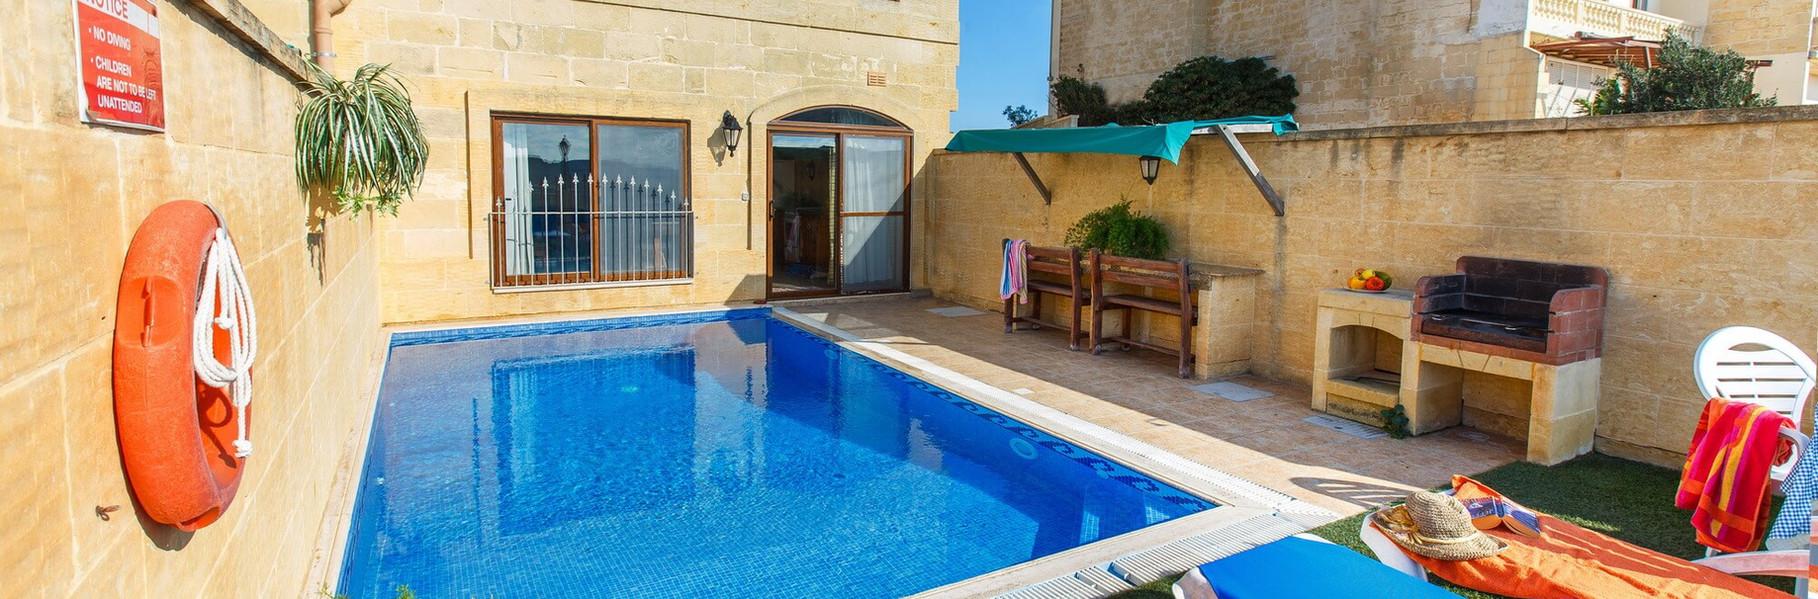 farmhouse-terracce-pool.jpg